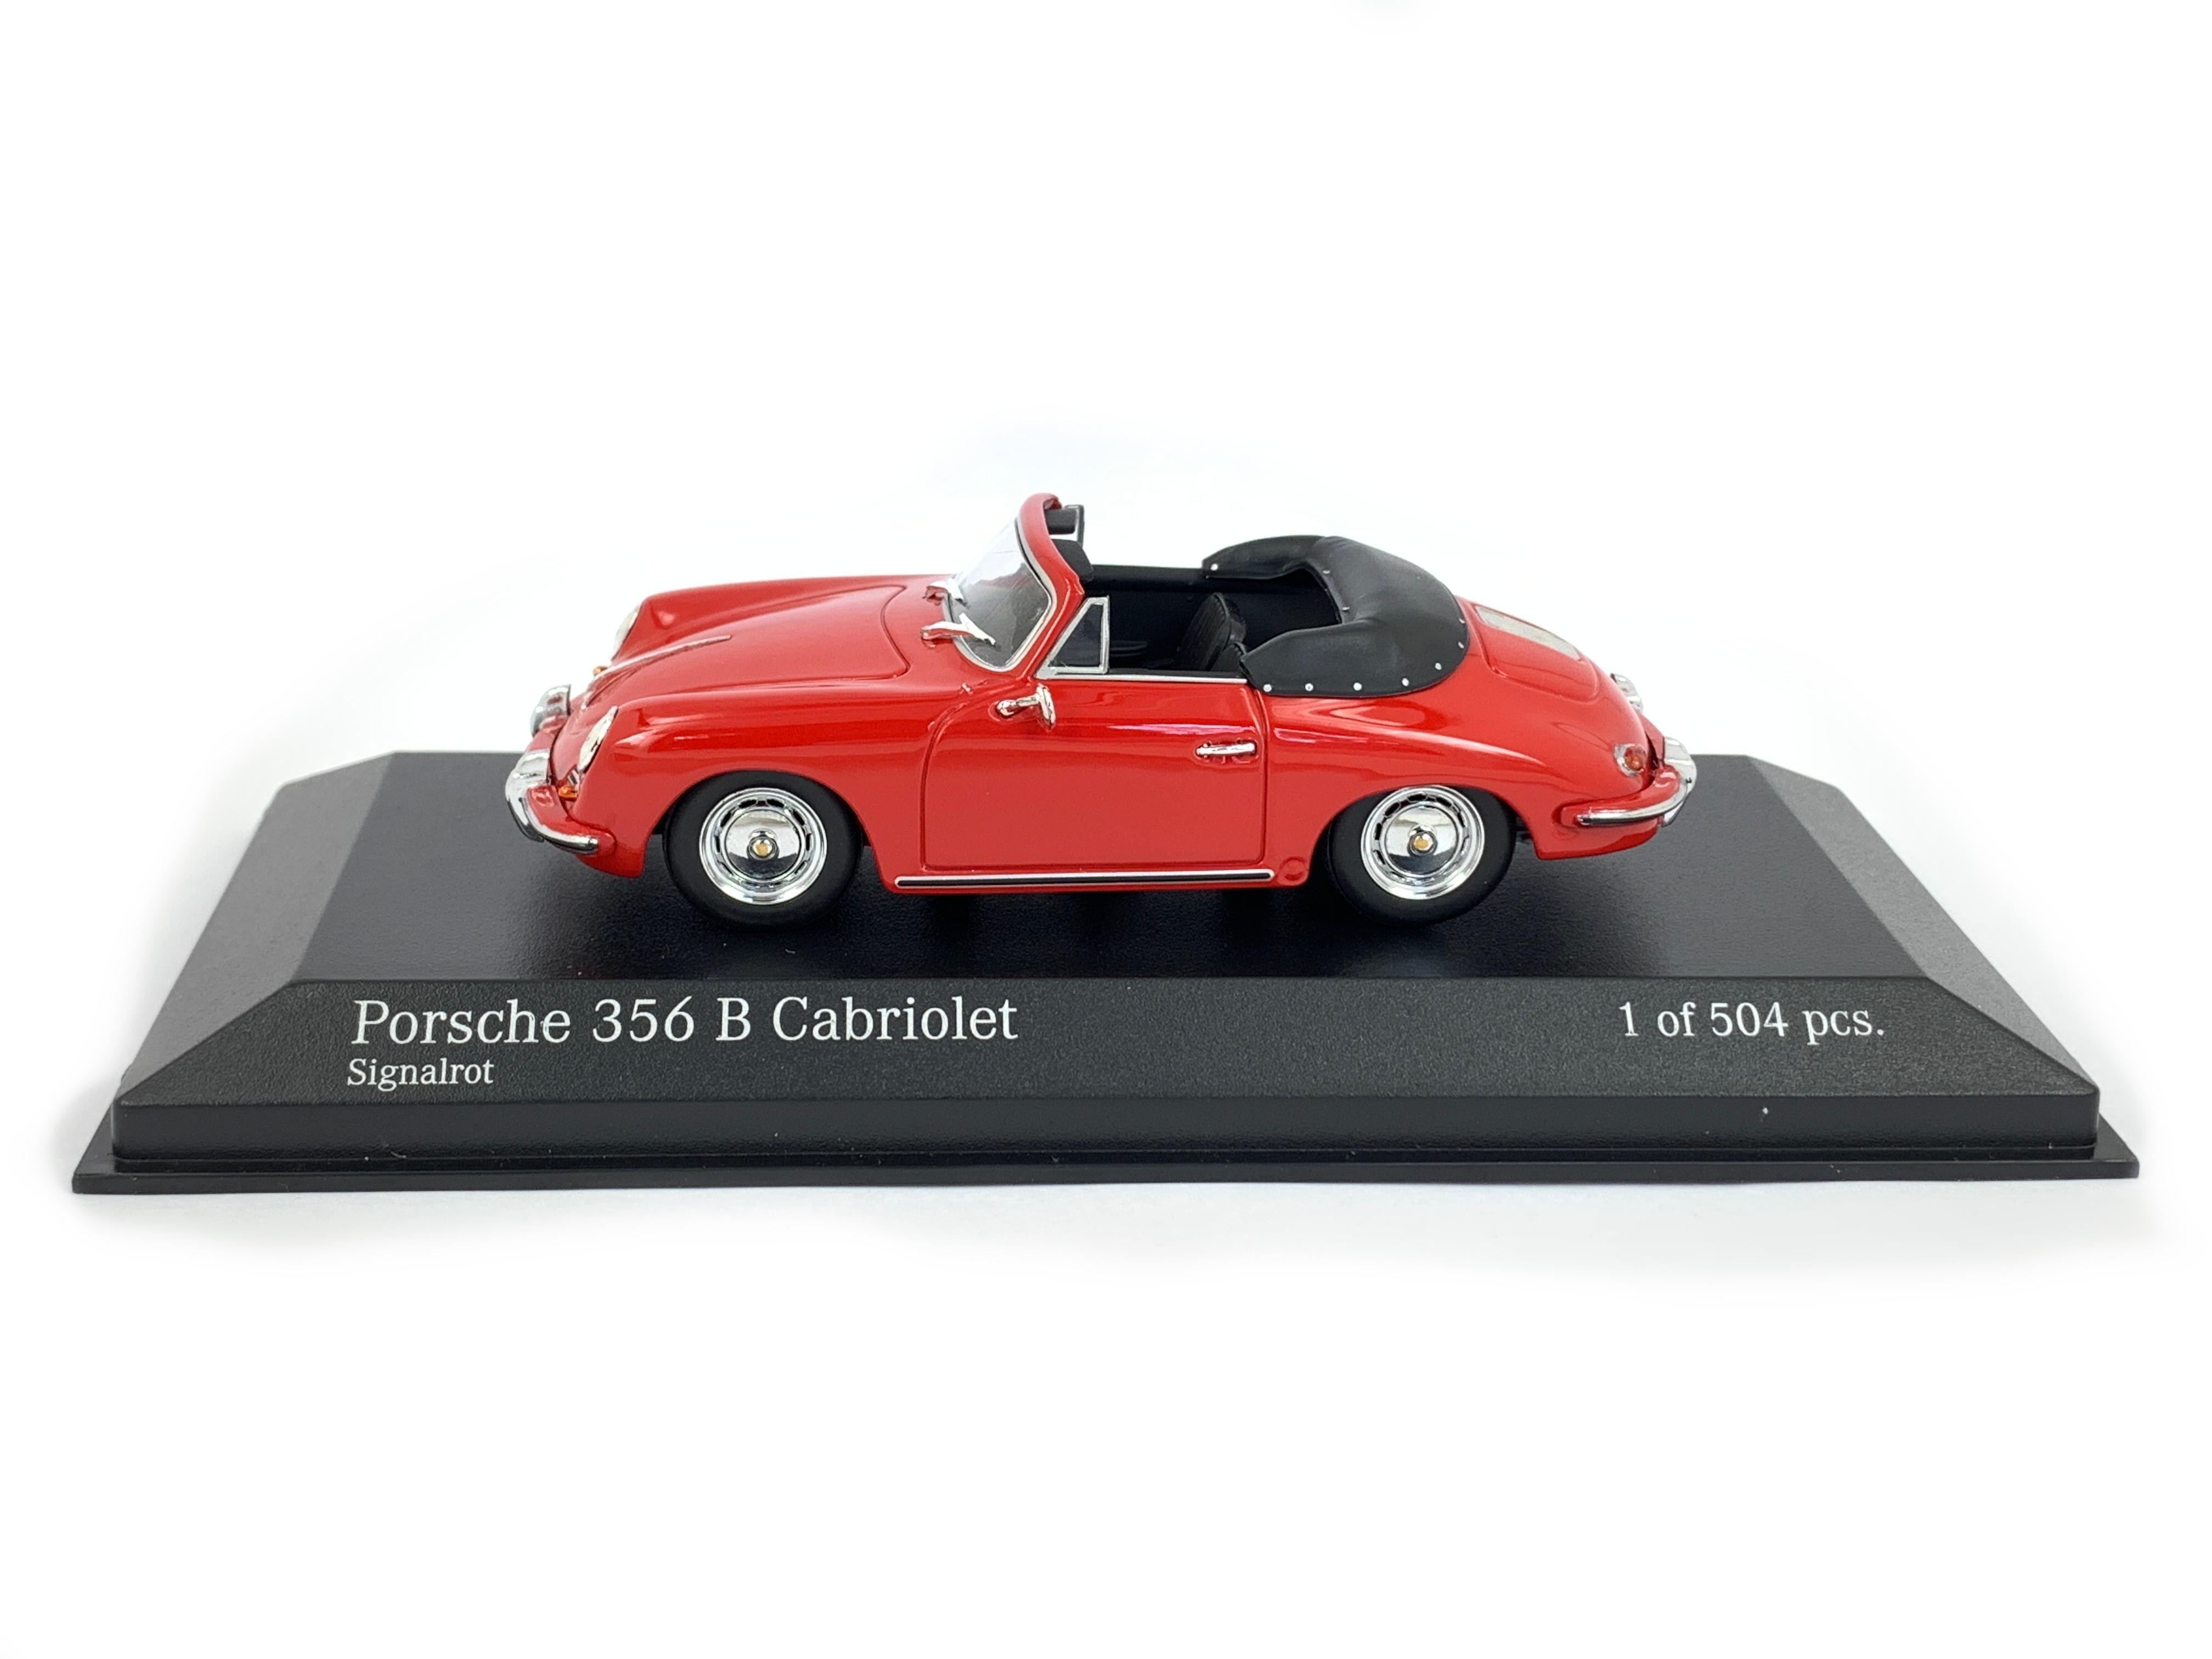 Minichamps 1 43 Die Cast Porsche 356 B Cabriolet 1960 Signal Redred Ltd 504 Pcs